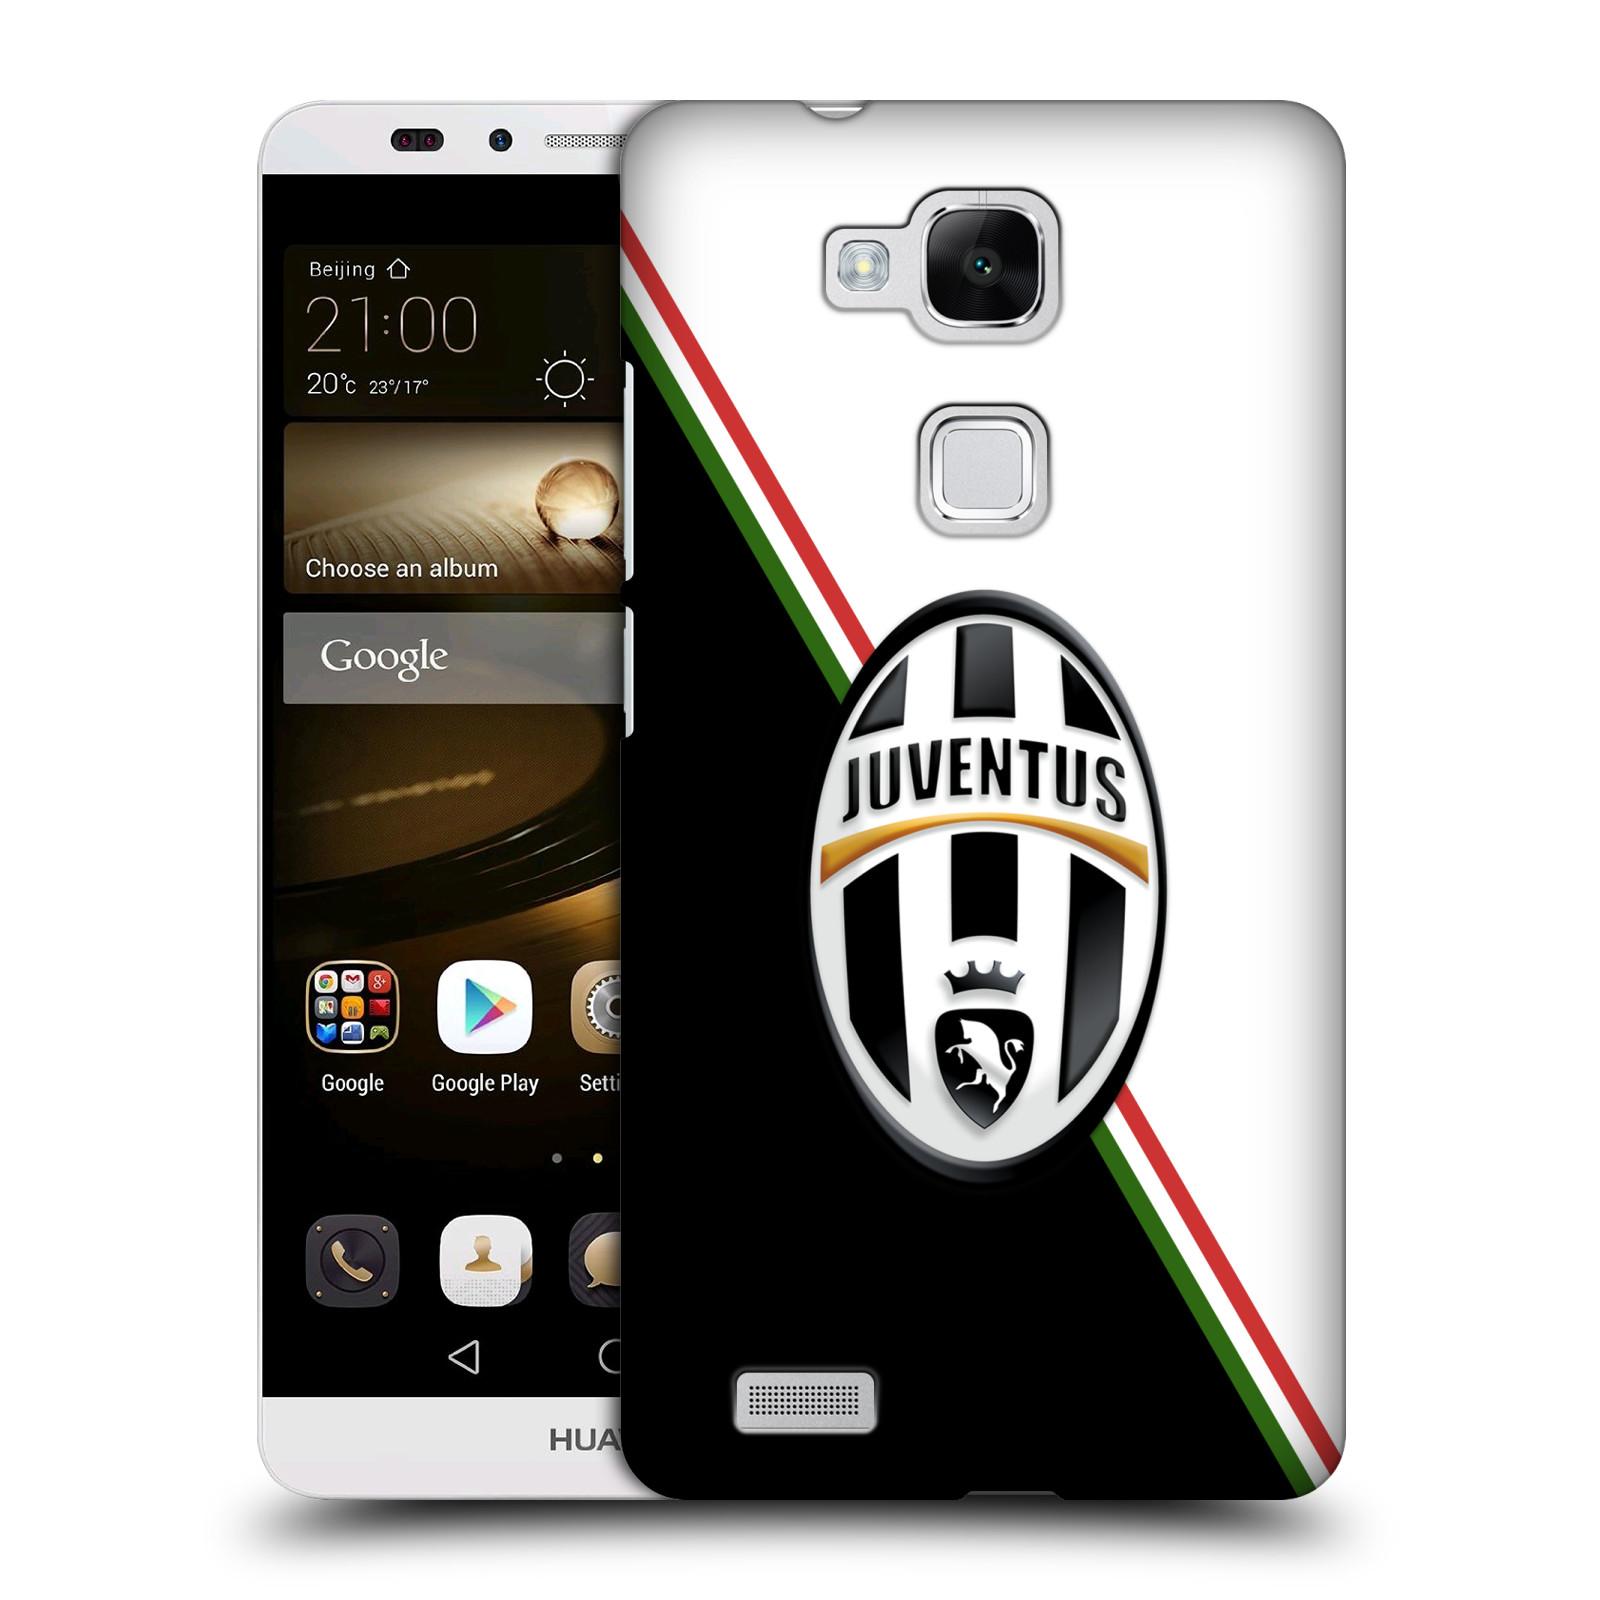 Plastové pouzdro na mobil Huawei Ascend Mate 7 HEAD CASE Juventus FC - Black and White (Plastový kryt či obal na mobilní telefon Juventus FC Official pro Huawei Ascend Mate7)